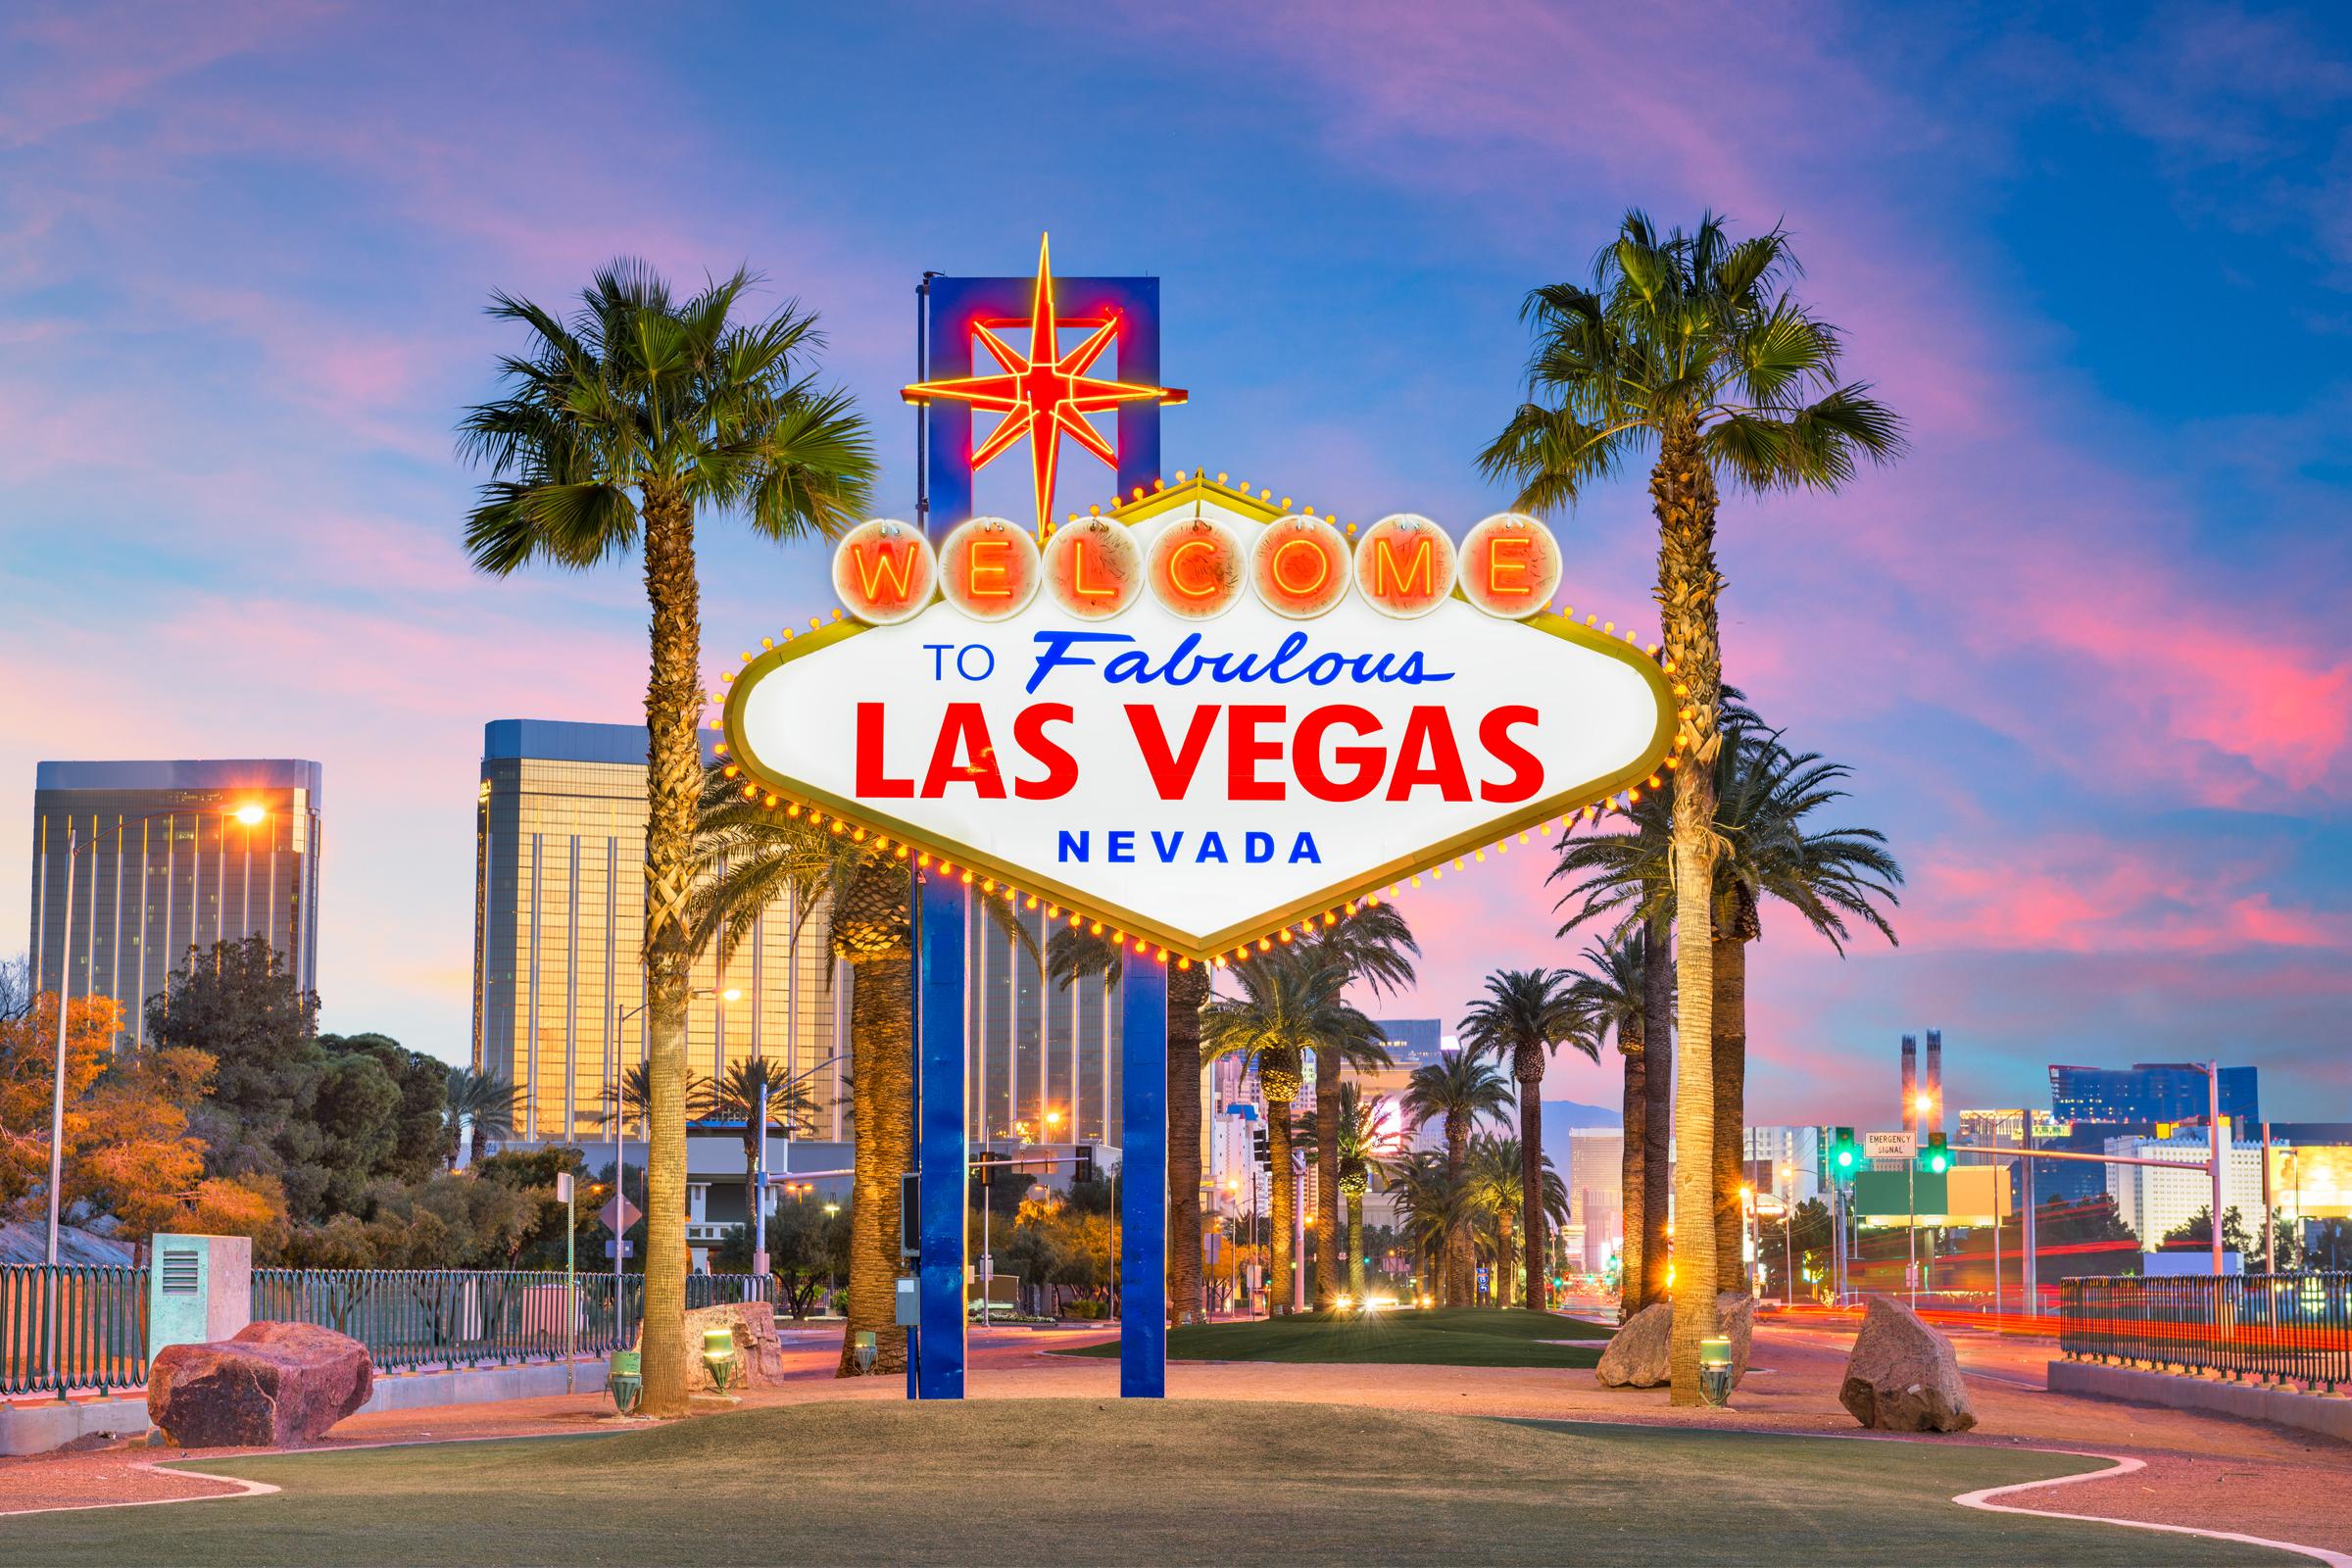 Las Vegas lifts covid restrictions